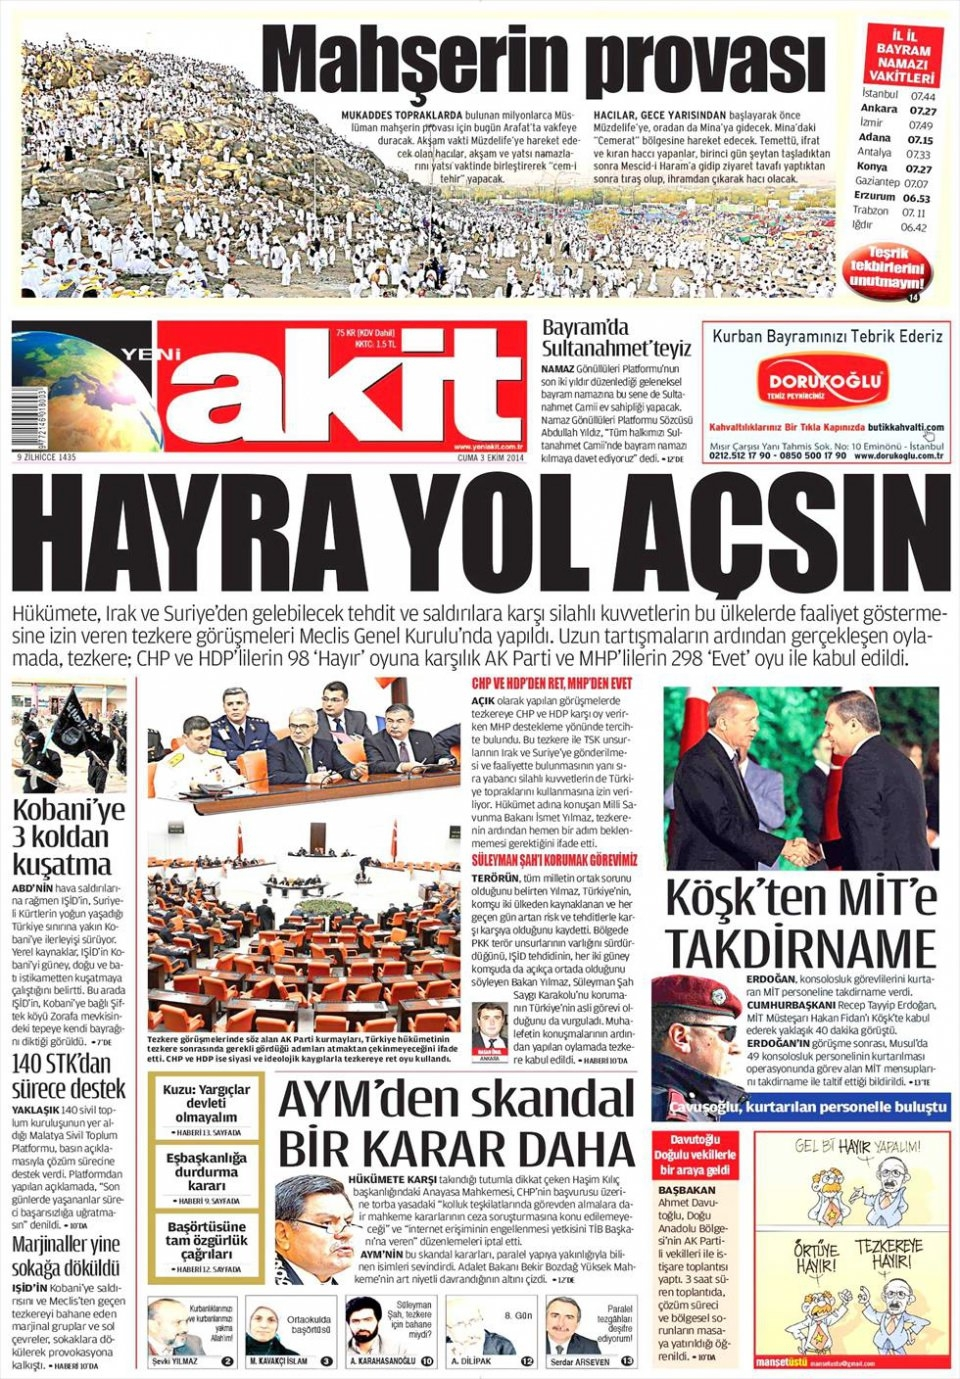 3 Ekim 2014 gazete manşetleri 22